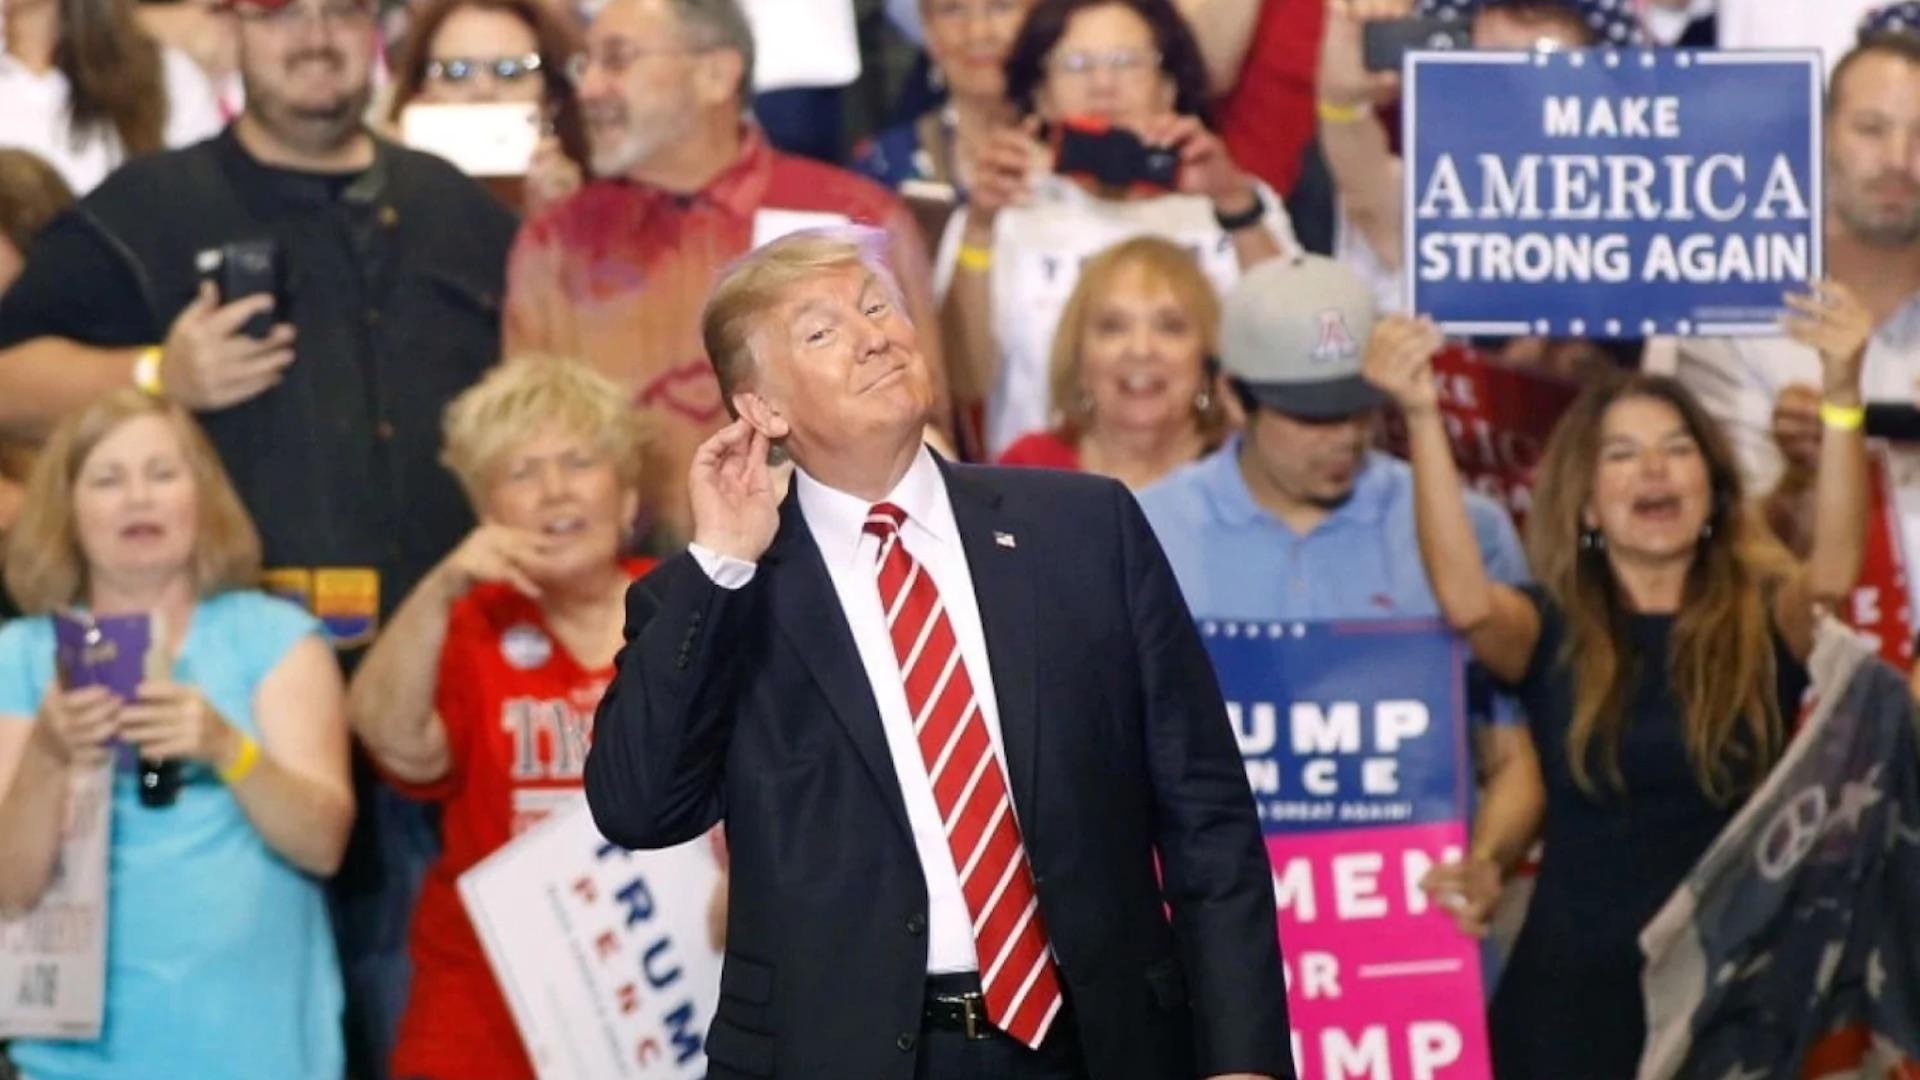 Feds on Trump's shutdown threat: 'It's blackmail'